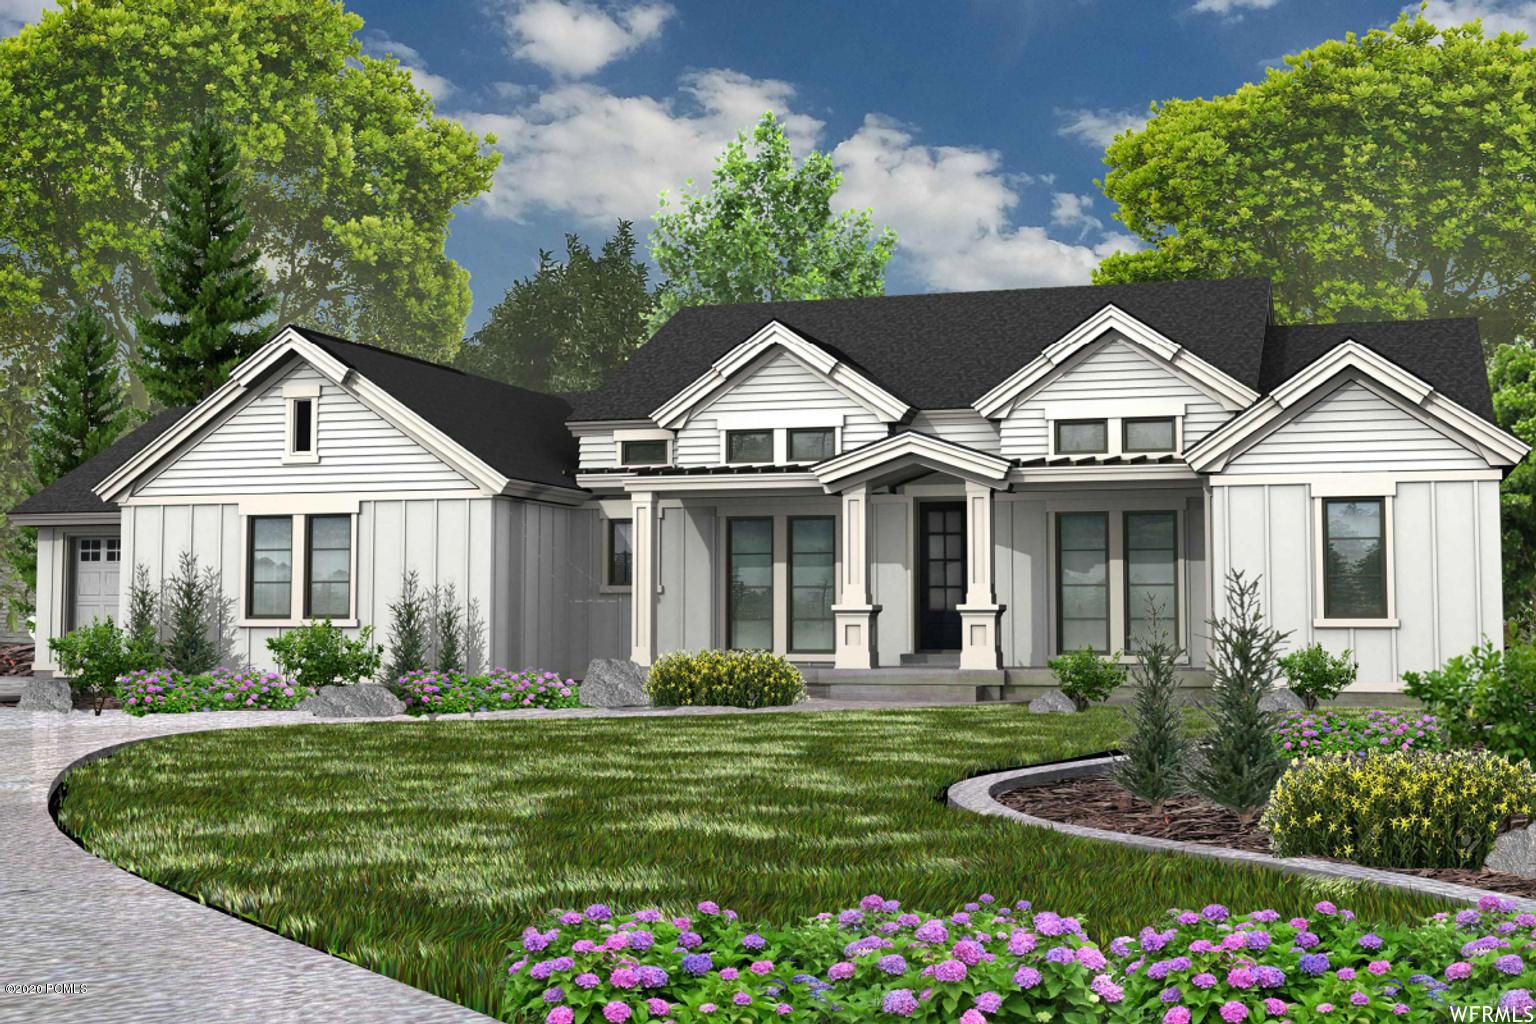 427 1850 E, Heber City, Utah 84032, 4 Bedrooms Bedrooms, ,3 BathroomsBathrooms,Single Family,For Sale,1850 E,12003624